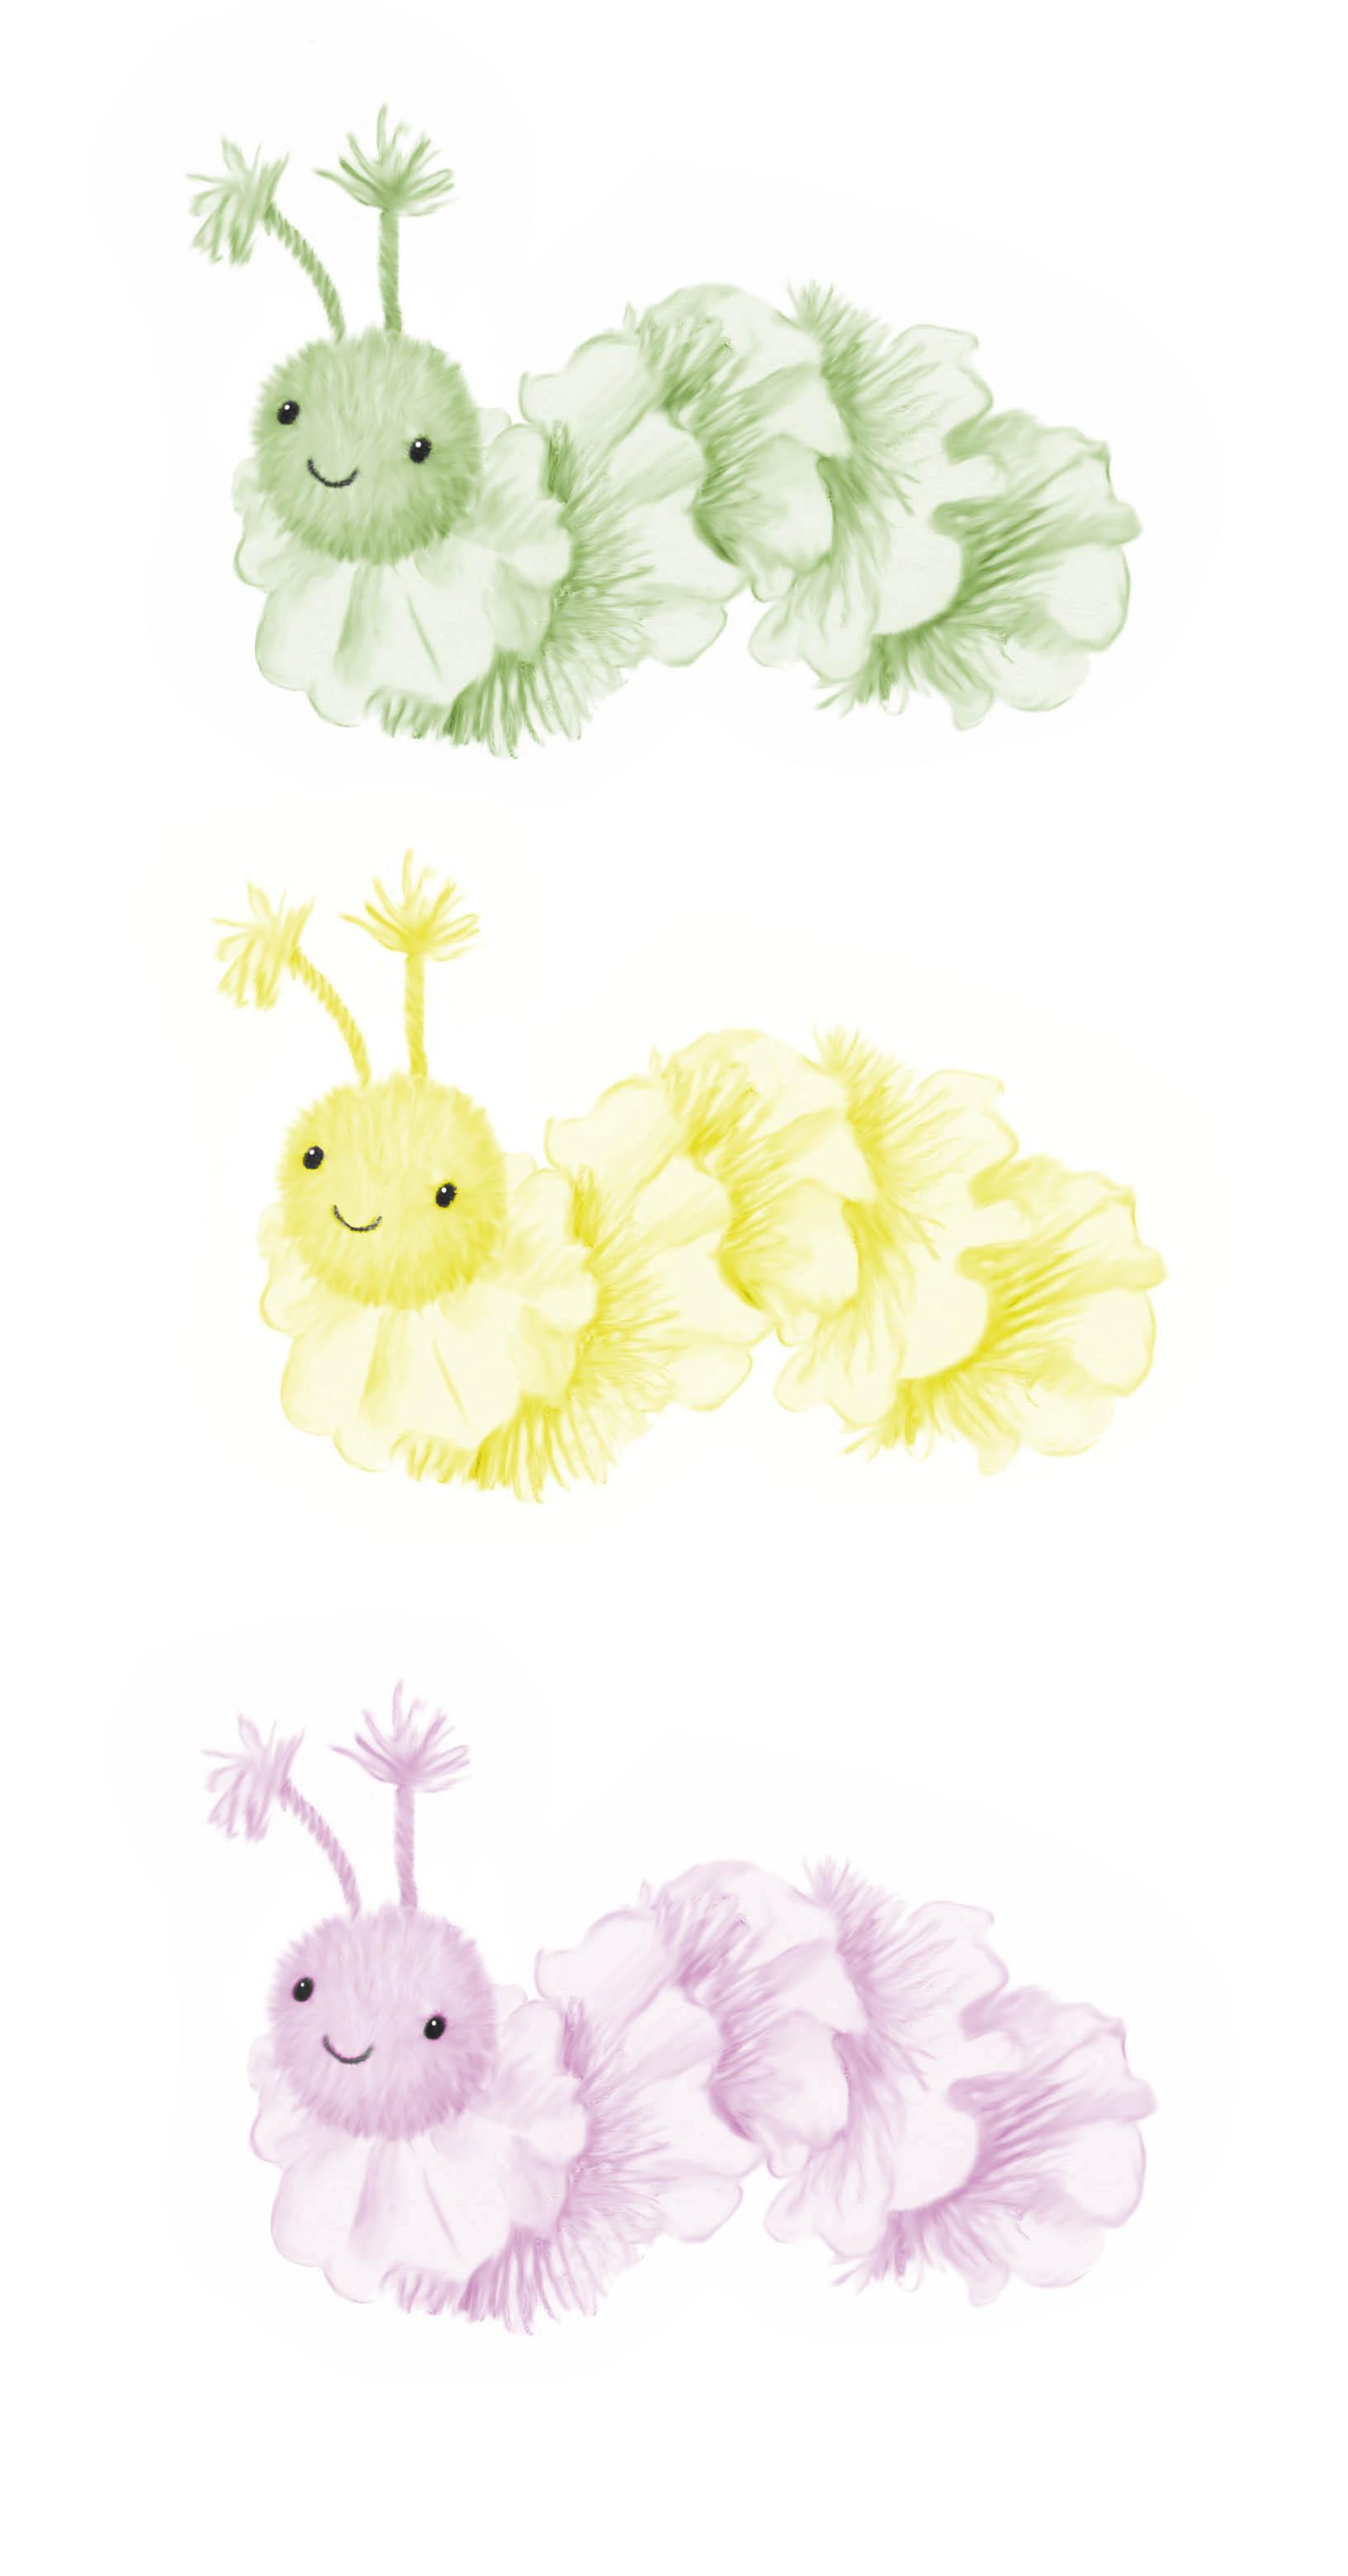 Caterpillars1